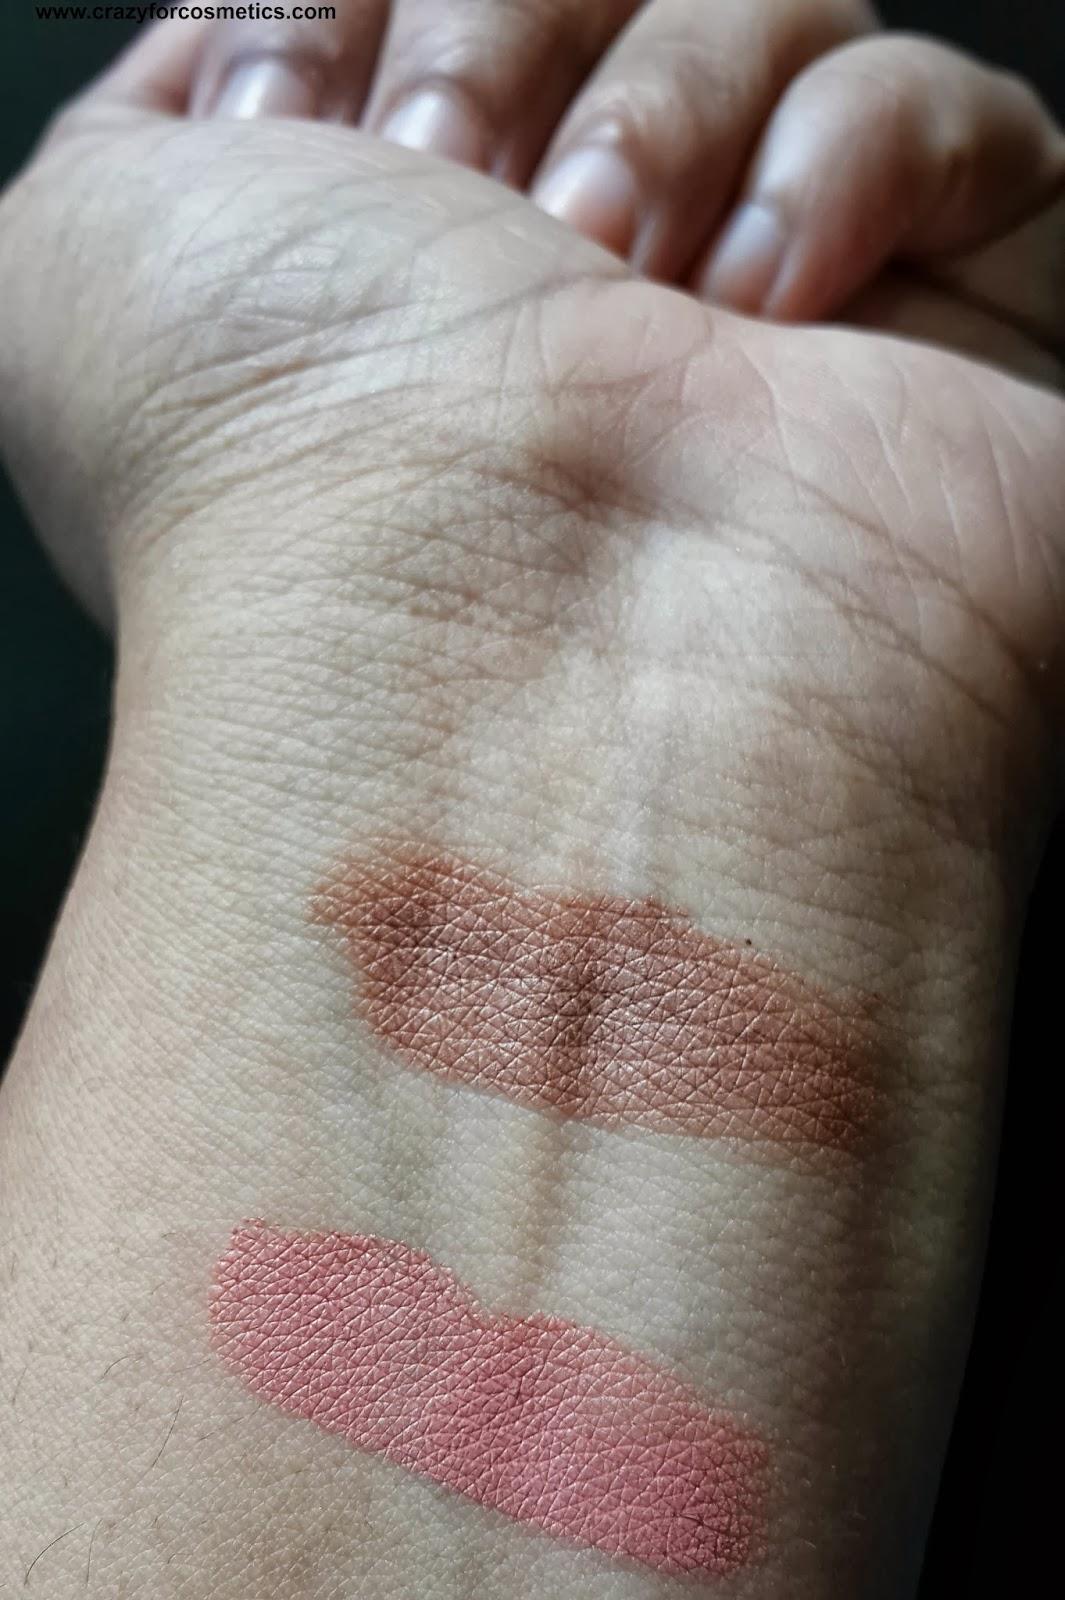 ELF Contouring Cream & Blush review Swatches